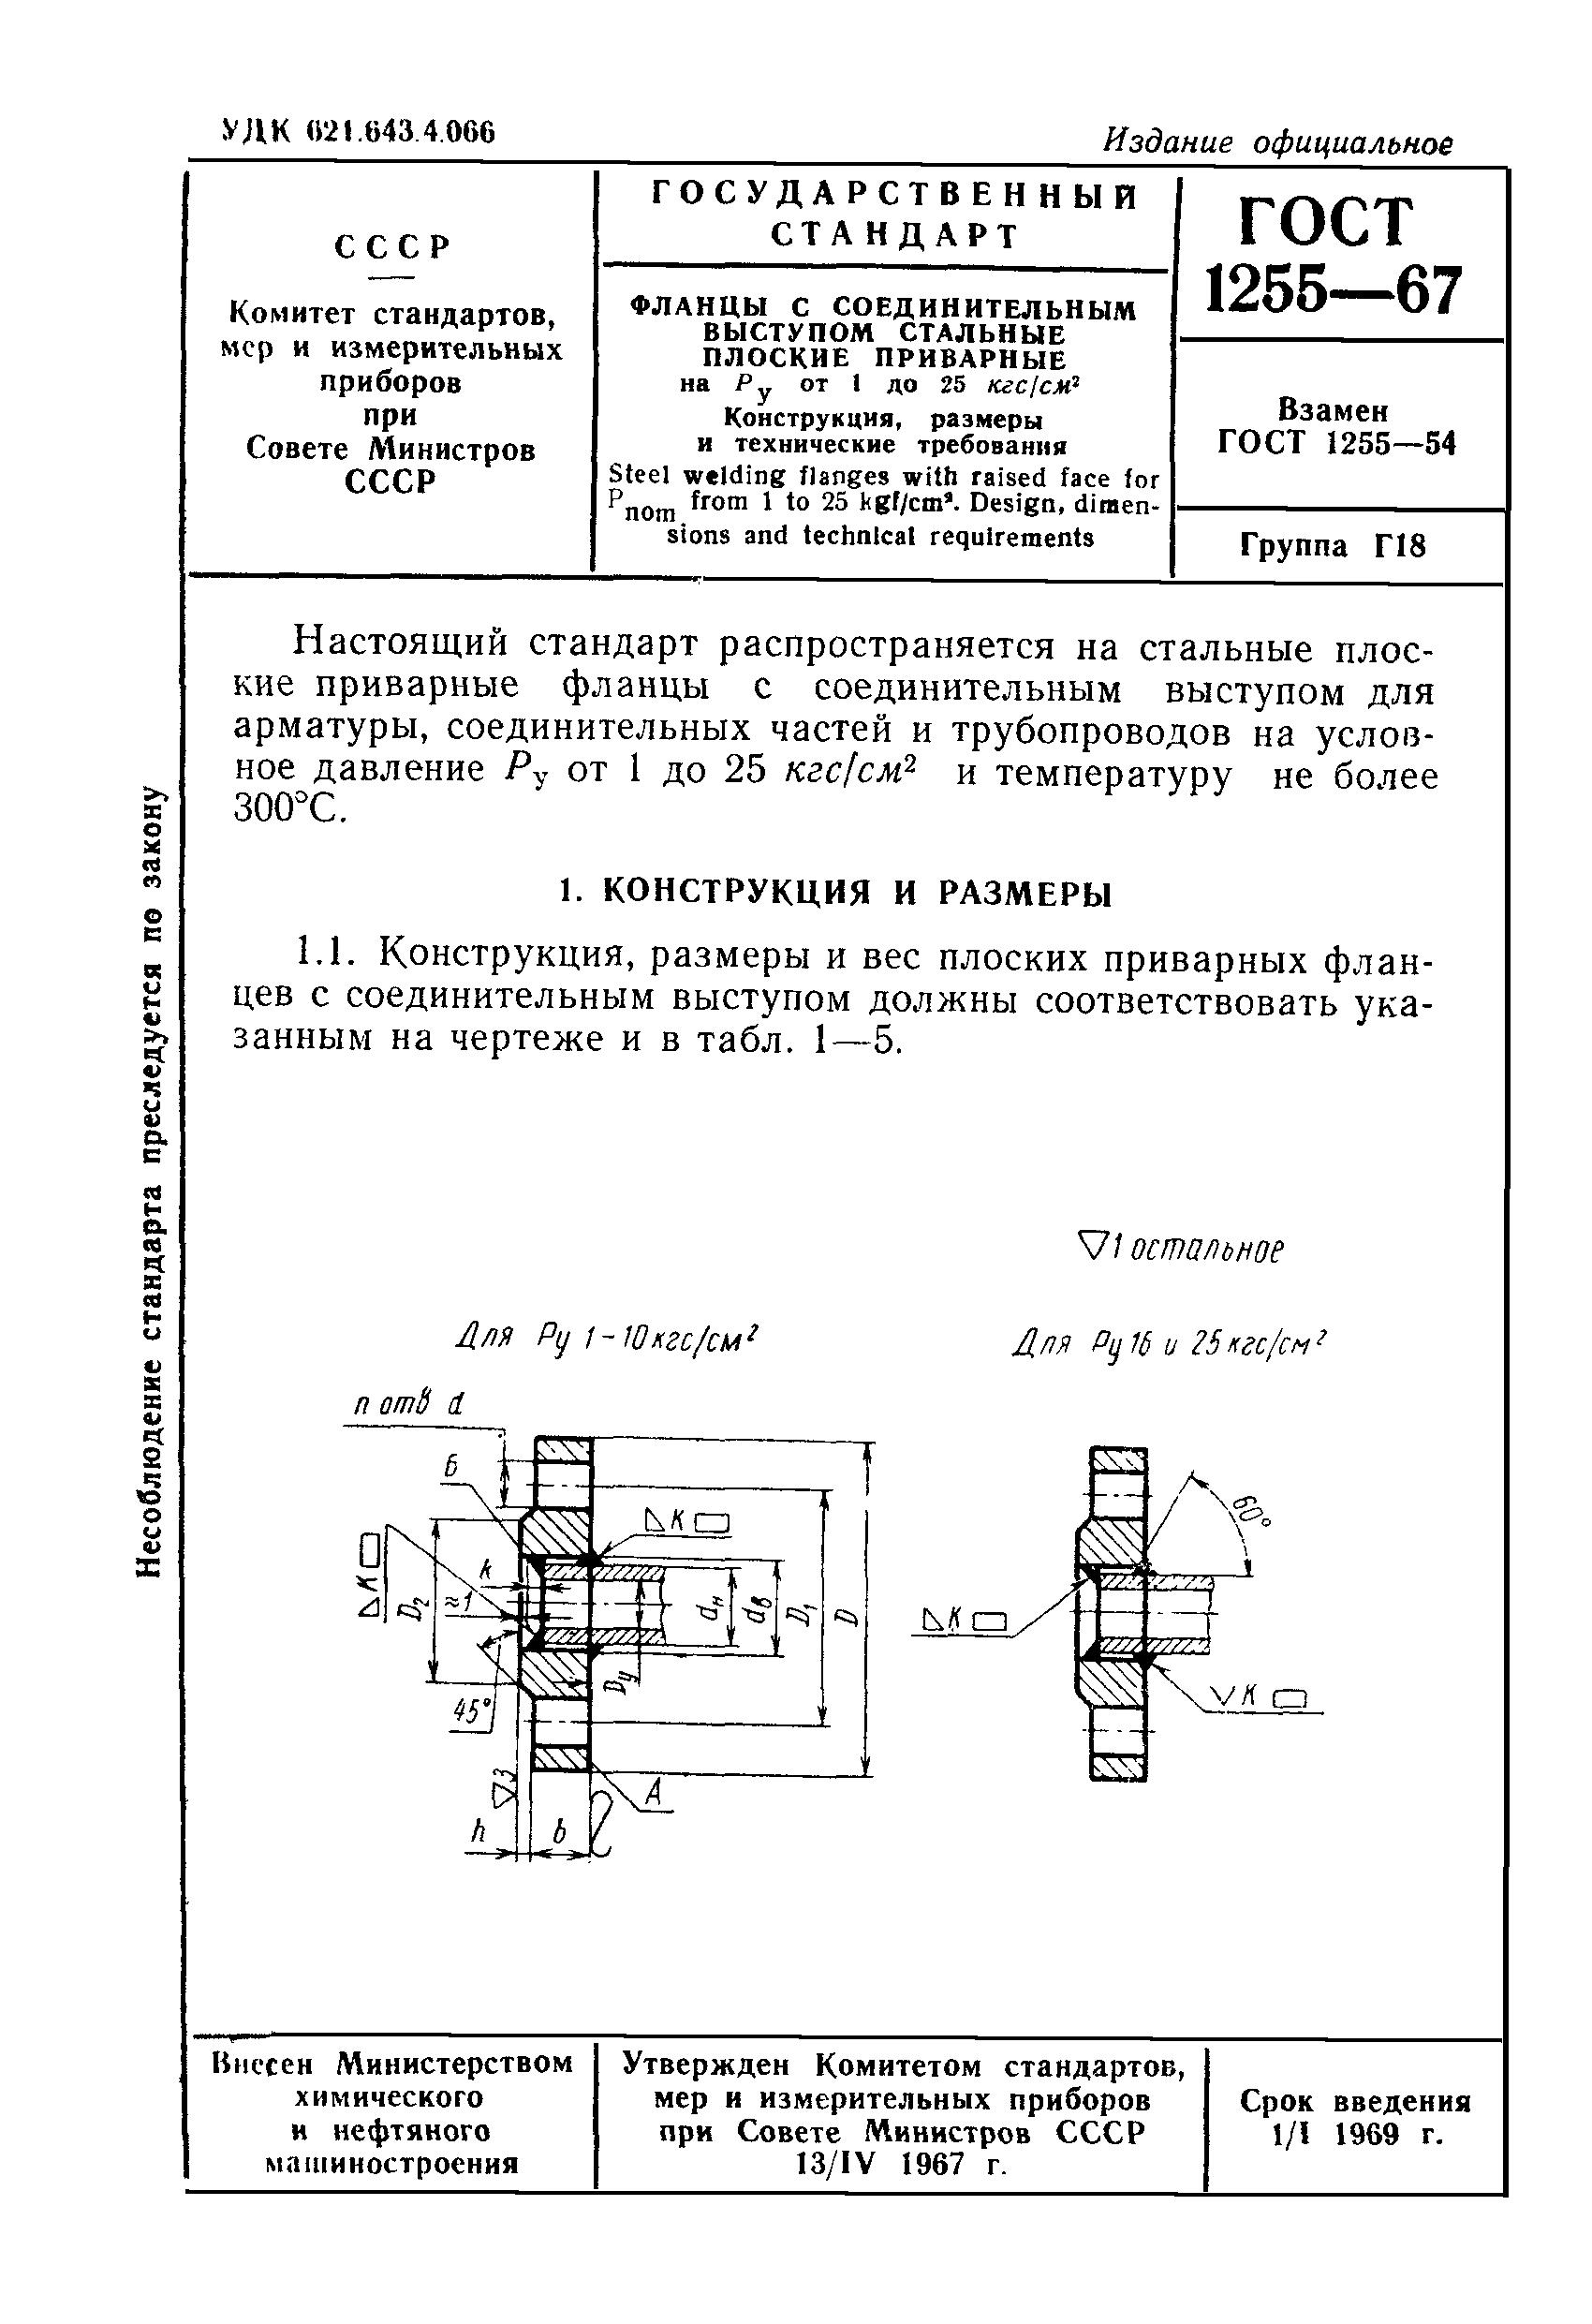 ГОСТ Р 2.903-96 ЕСКД. Правила поставки документации